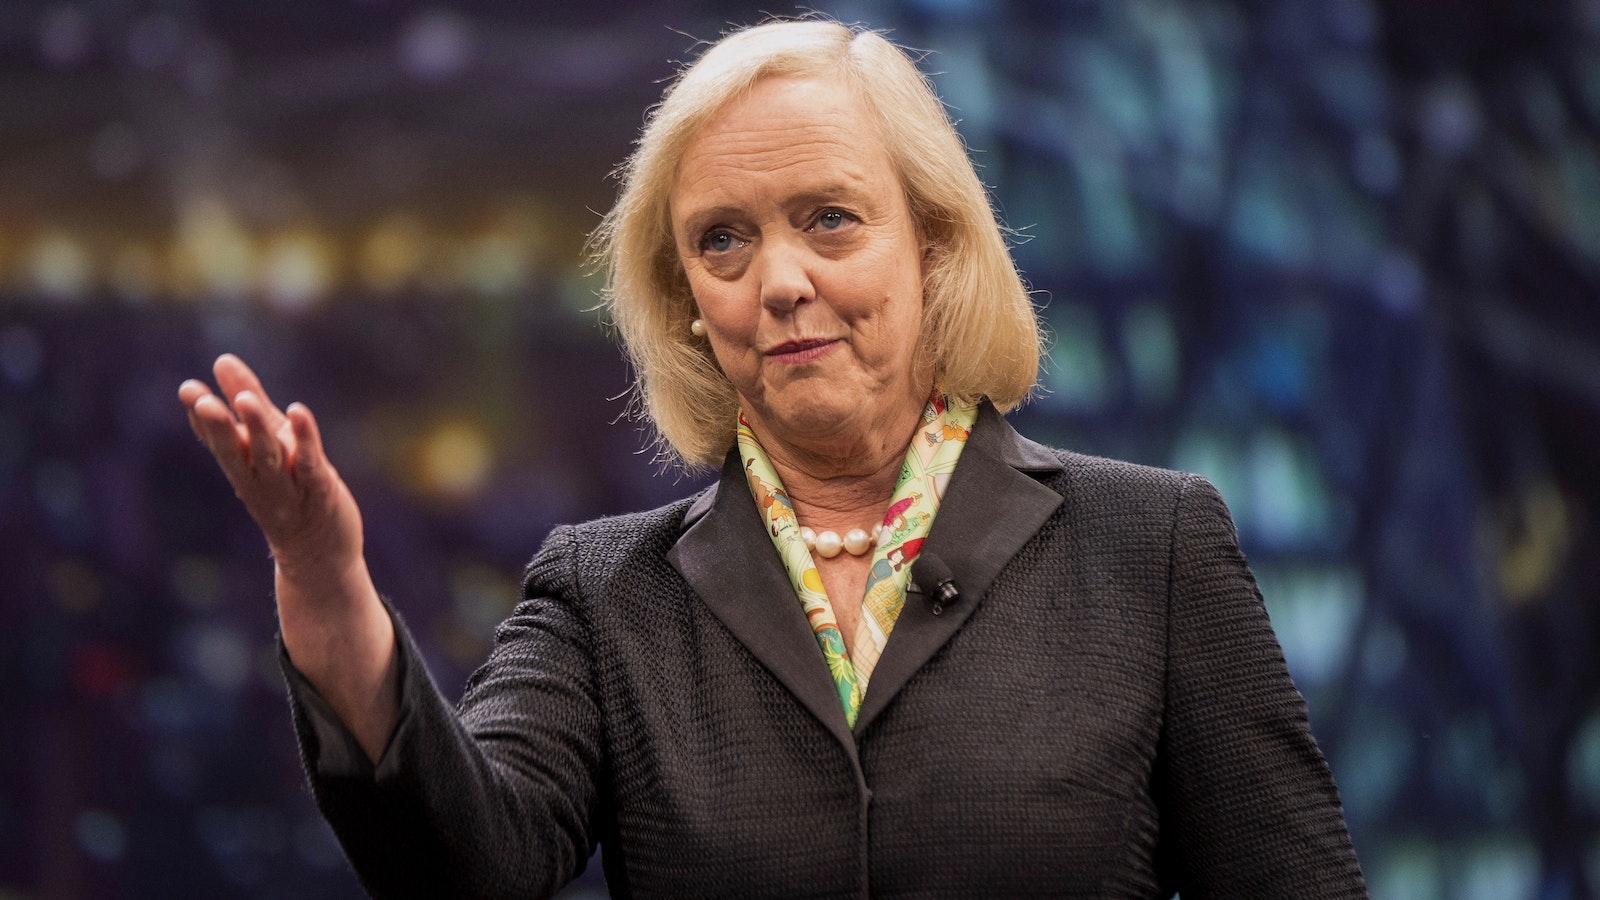 Hewlett Packard Enterprise CEO Meg Whitman. Photo by Bloomberg.